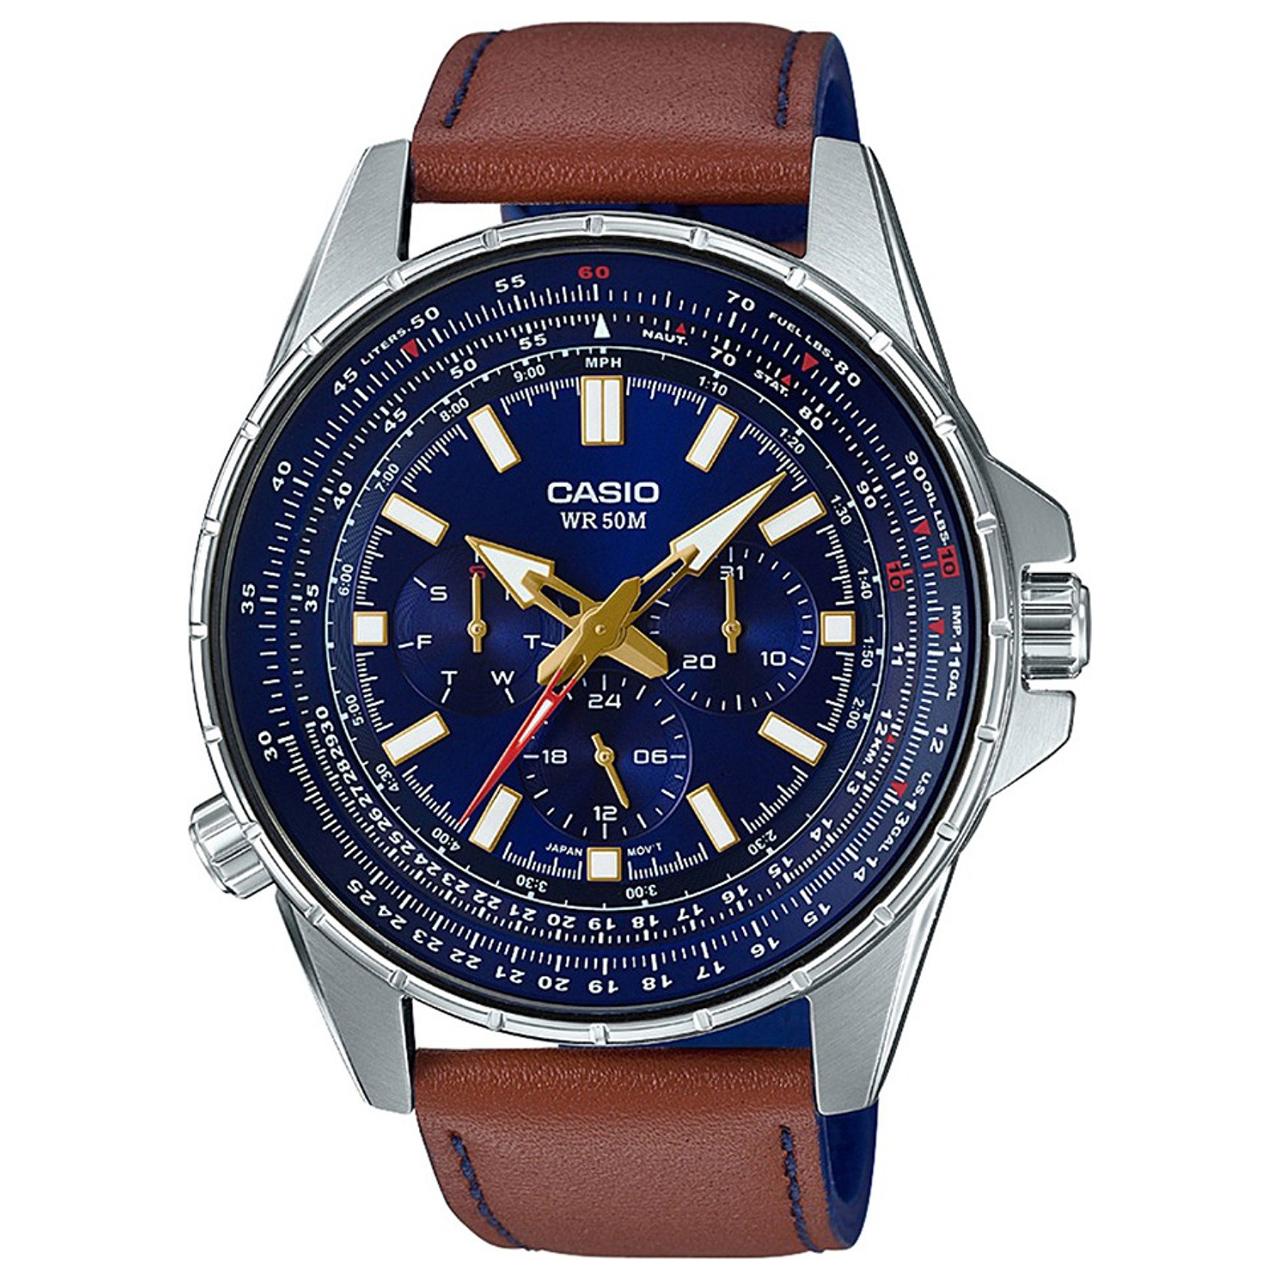 ساعت  کاسیو مدل MTP-SW320L-2AVDF